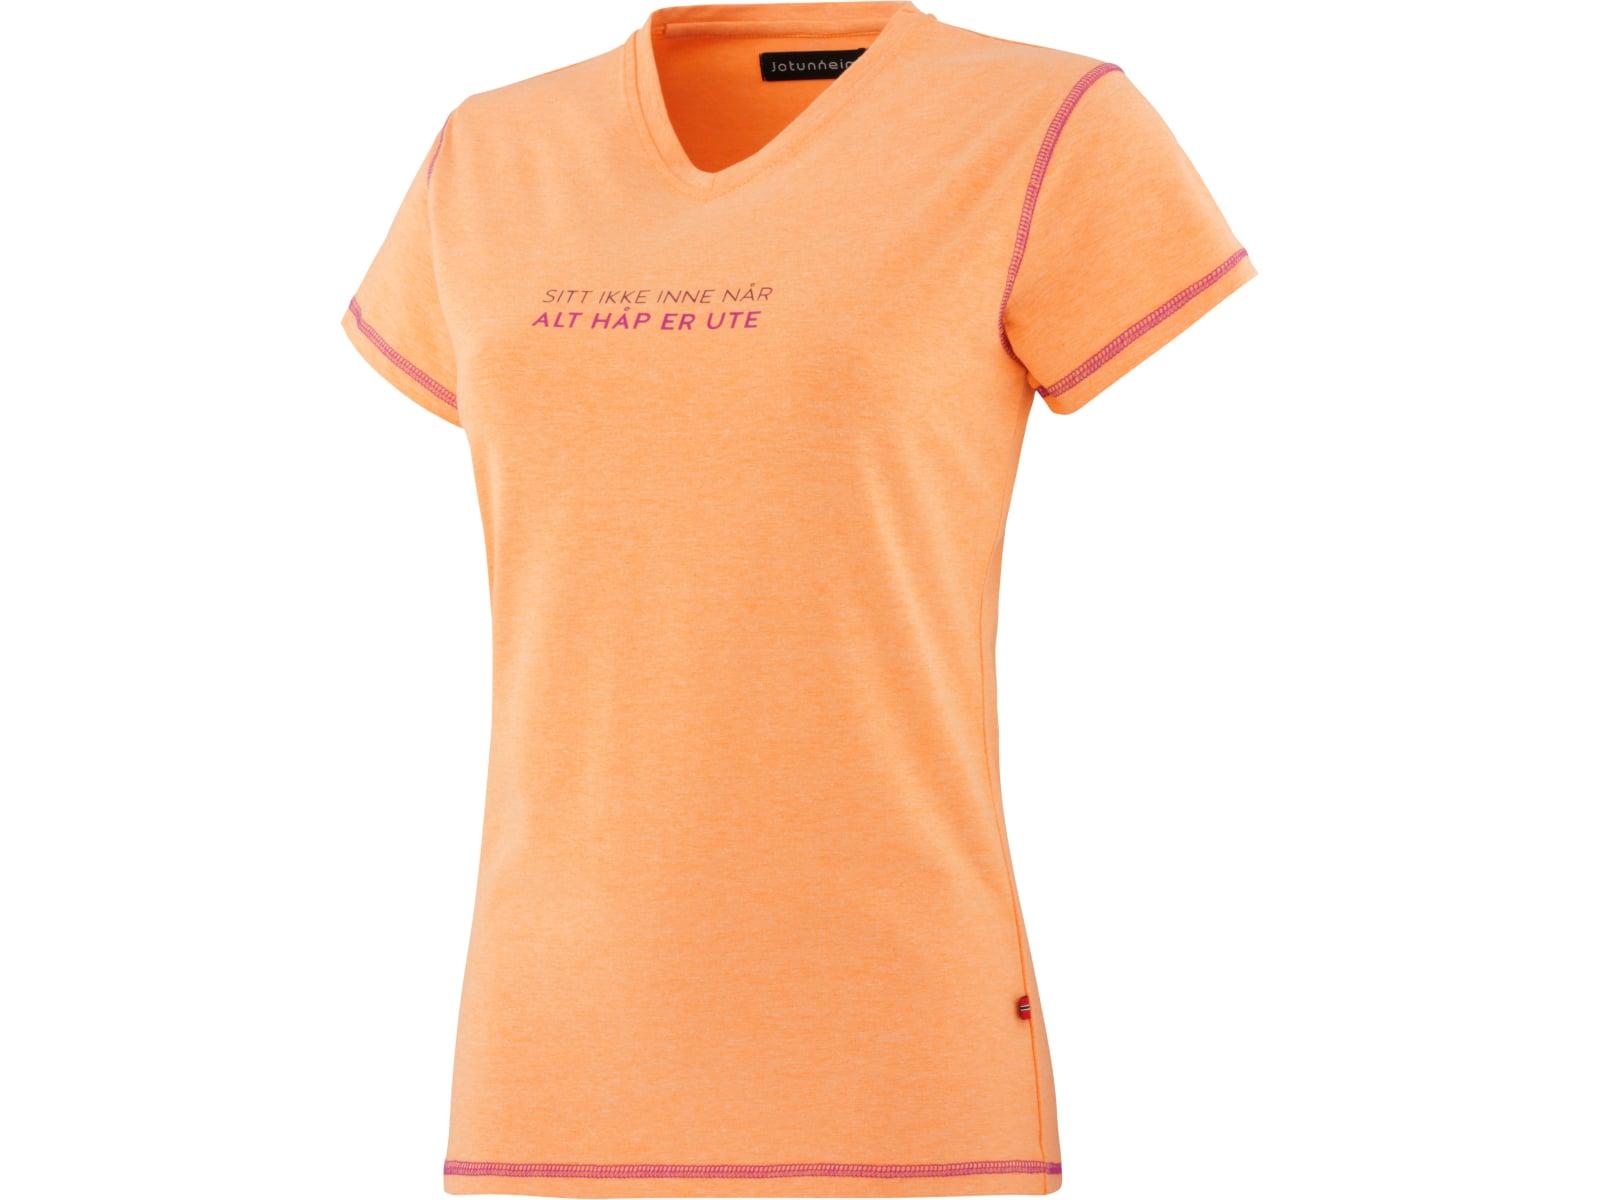 Jotunheim varde t shirt print for T shirt printing stonecrest mall